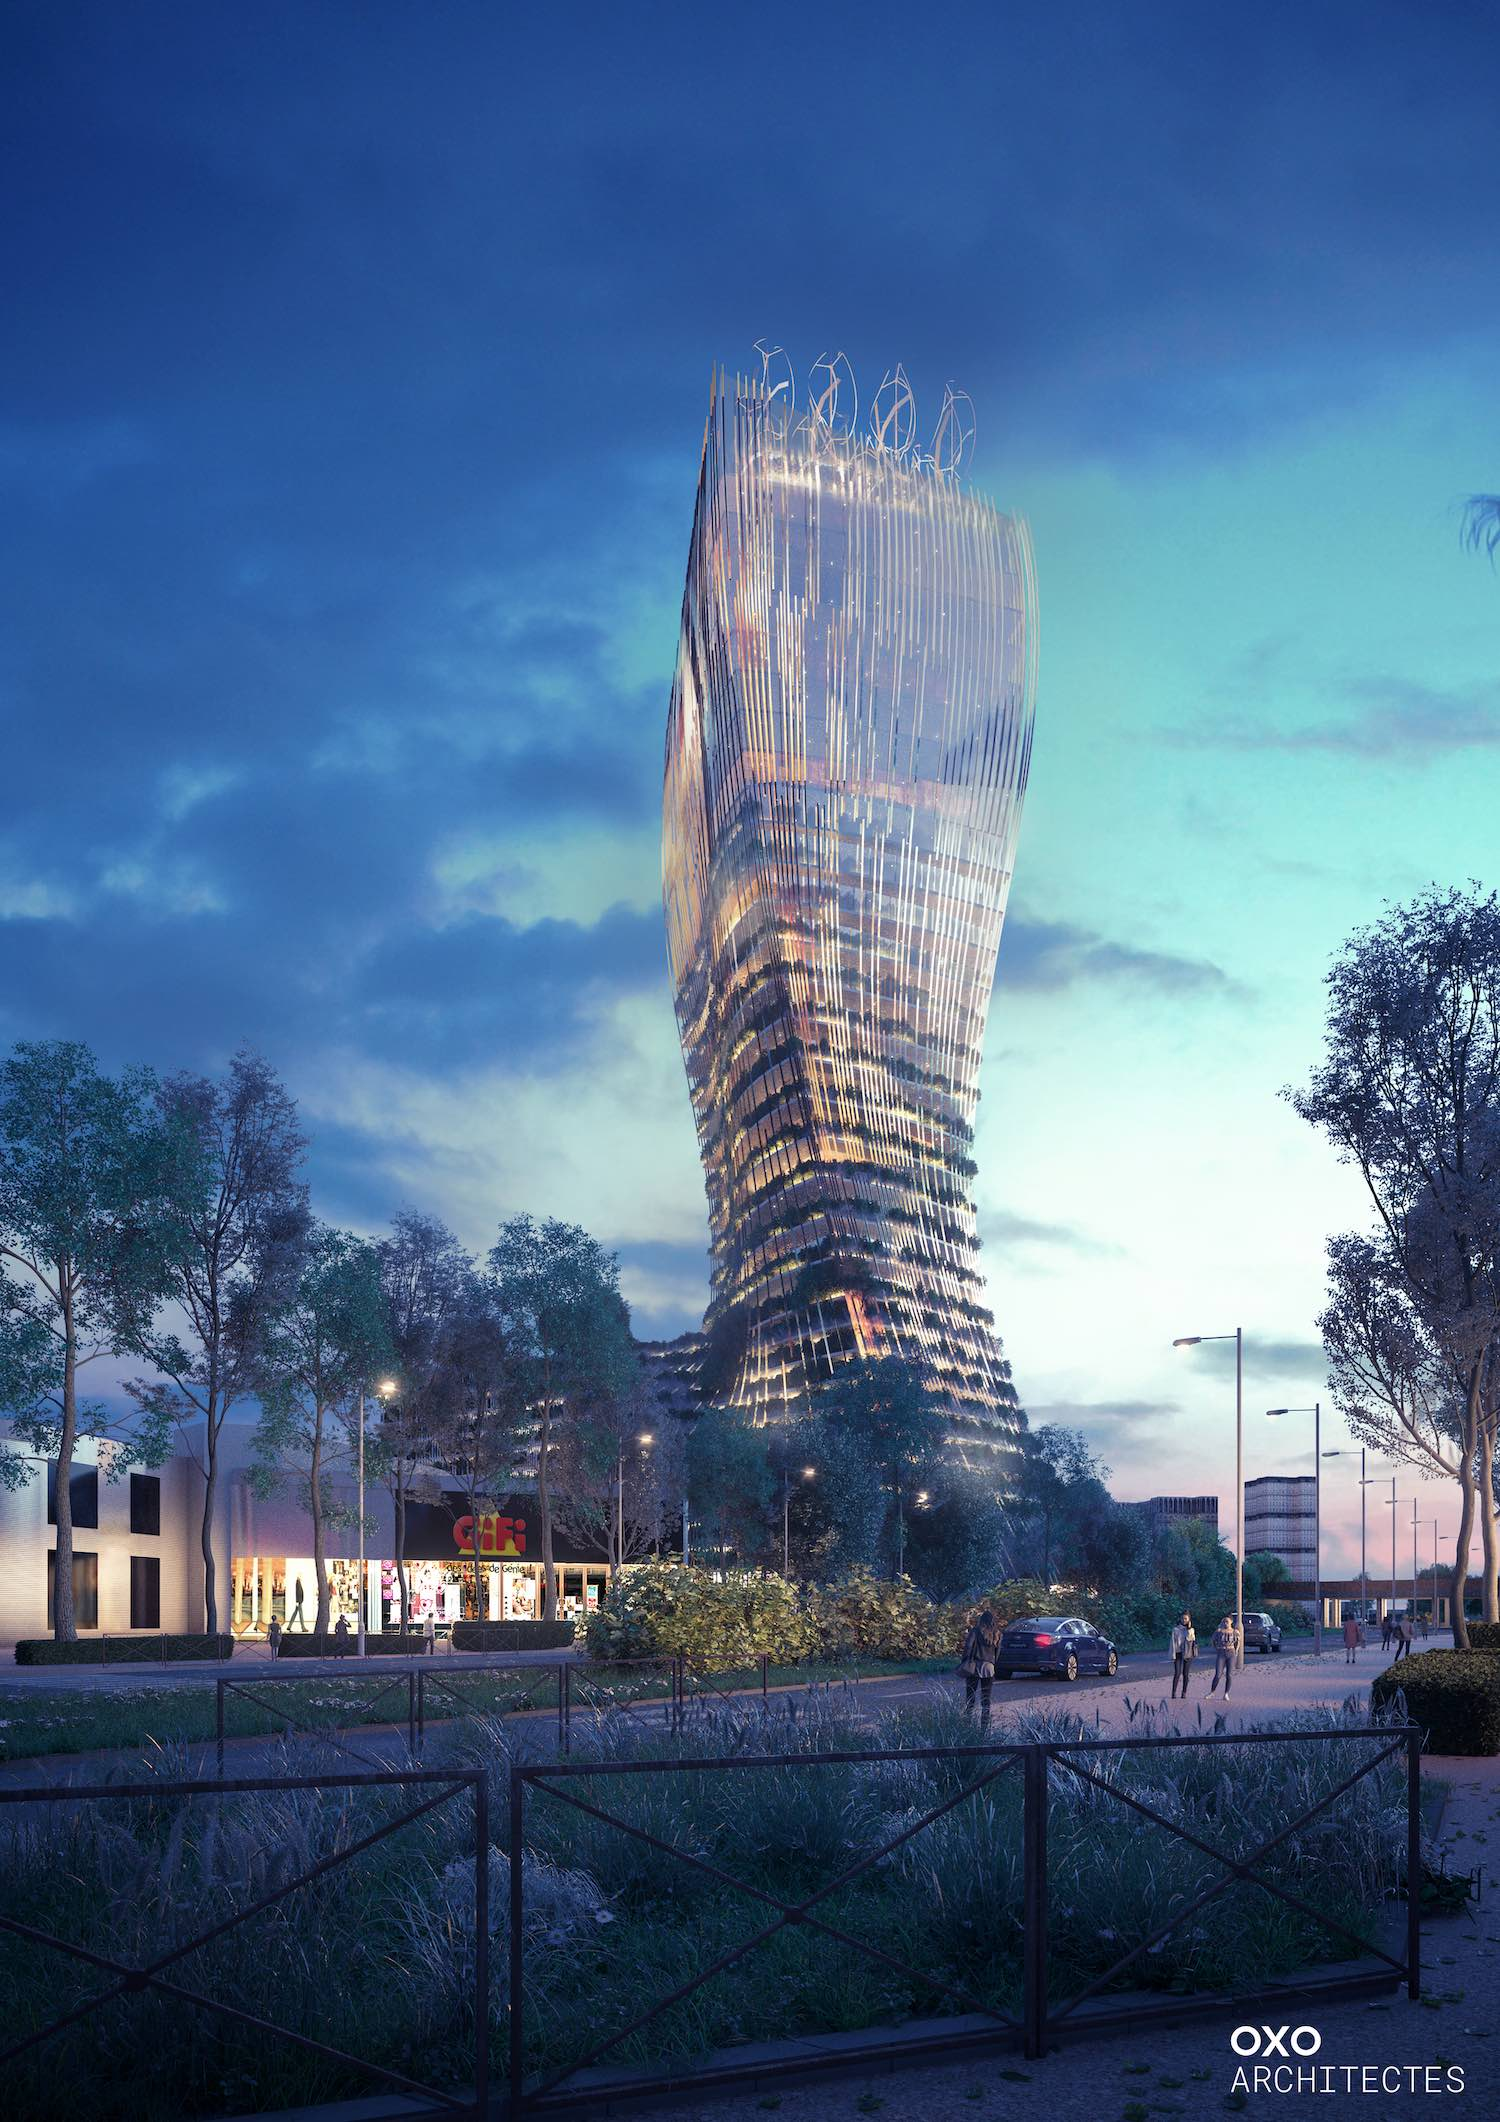 rendering image of a skyscraper